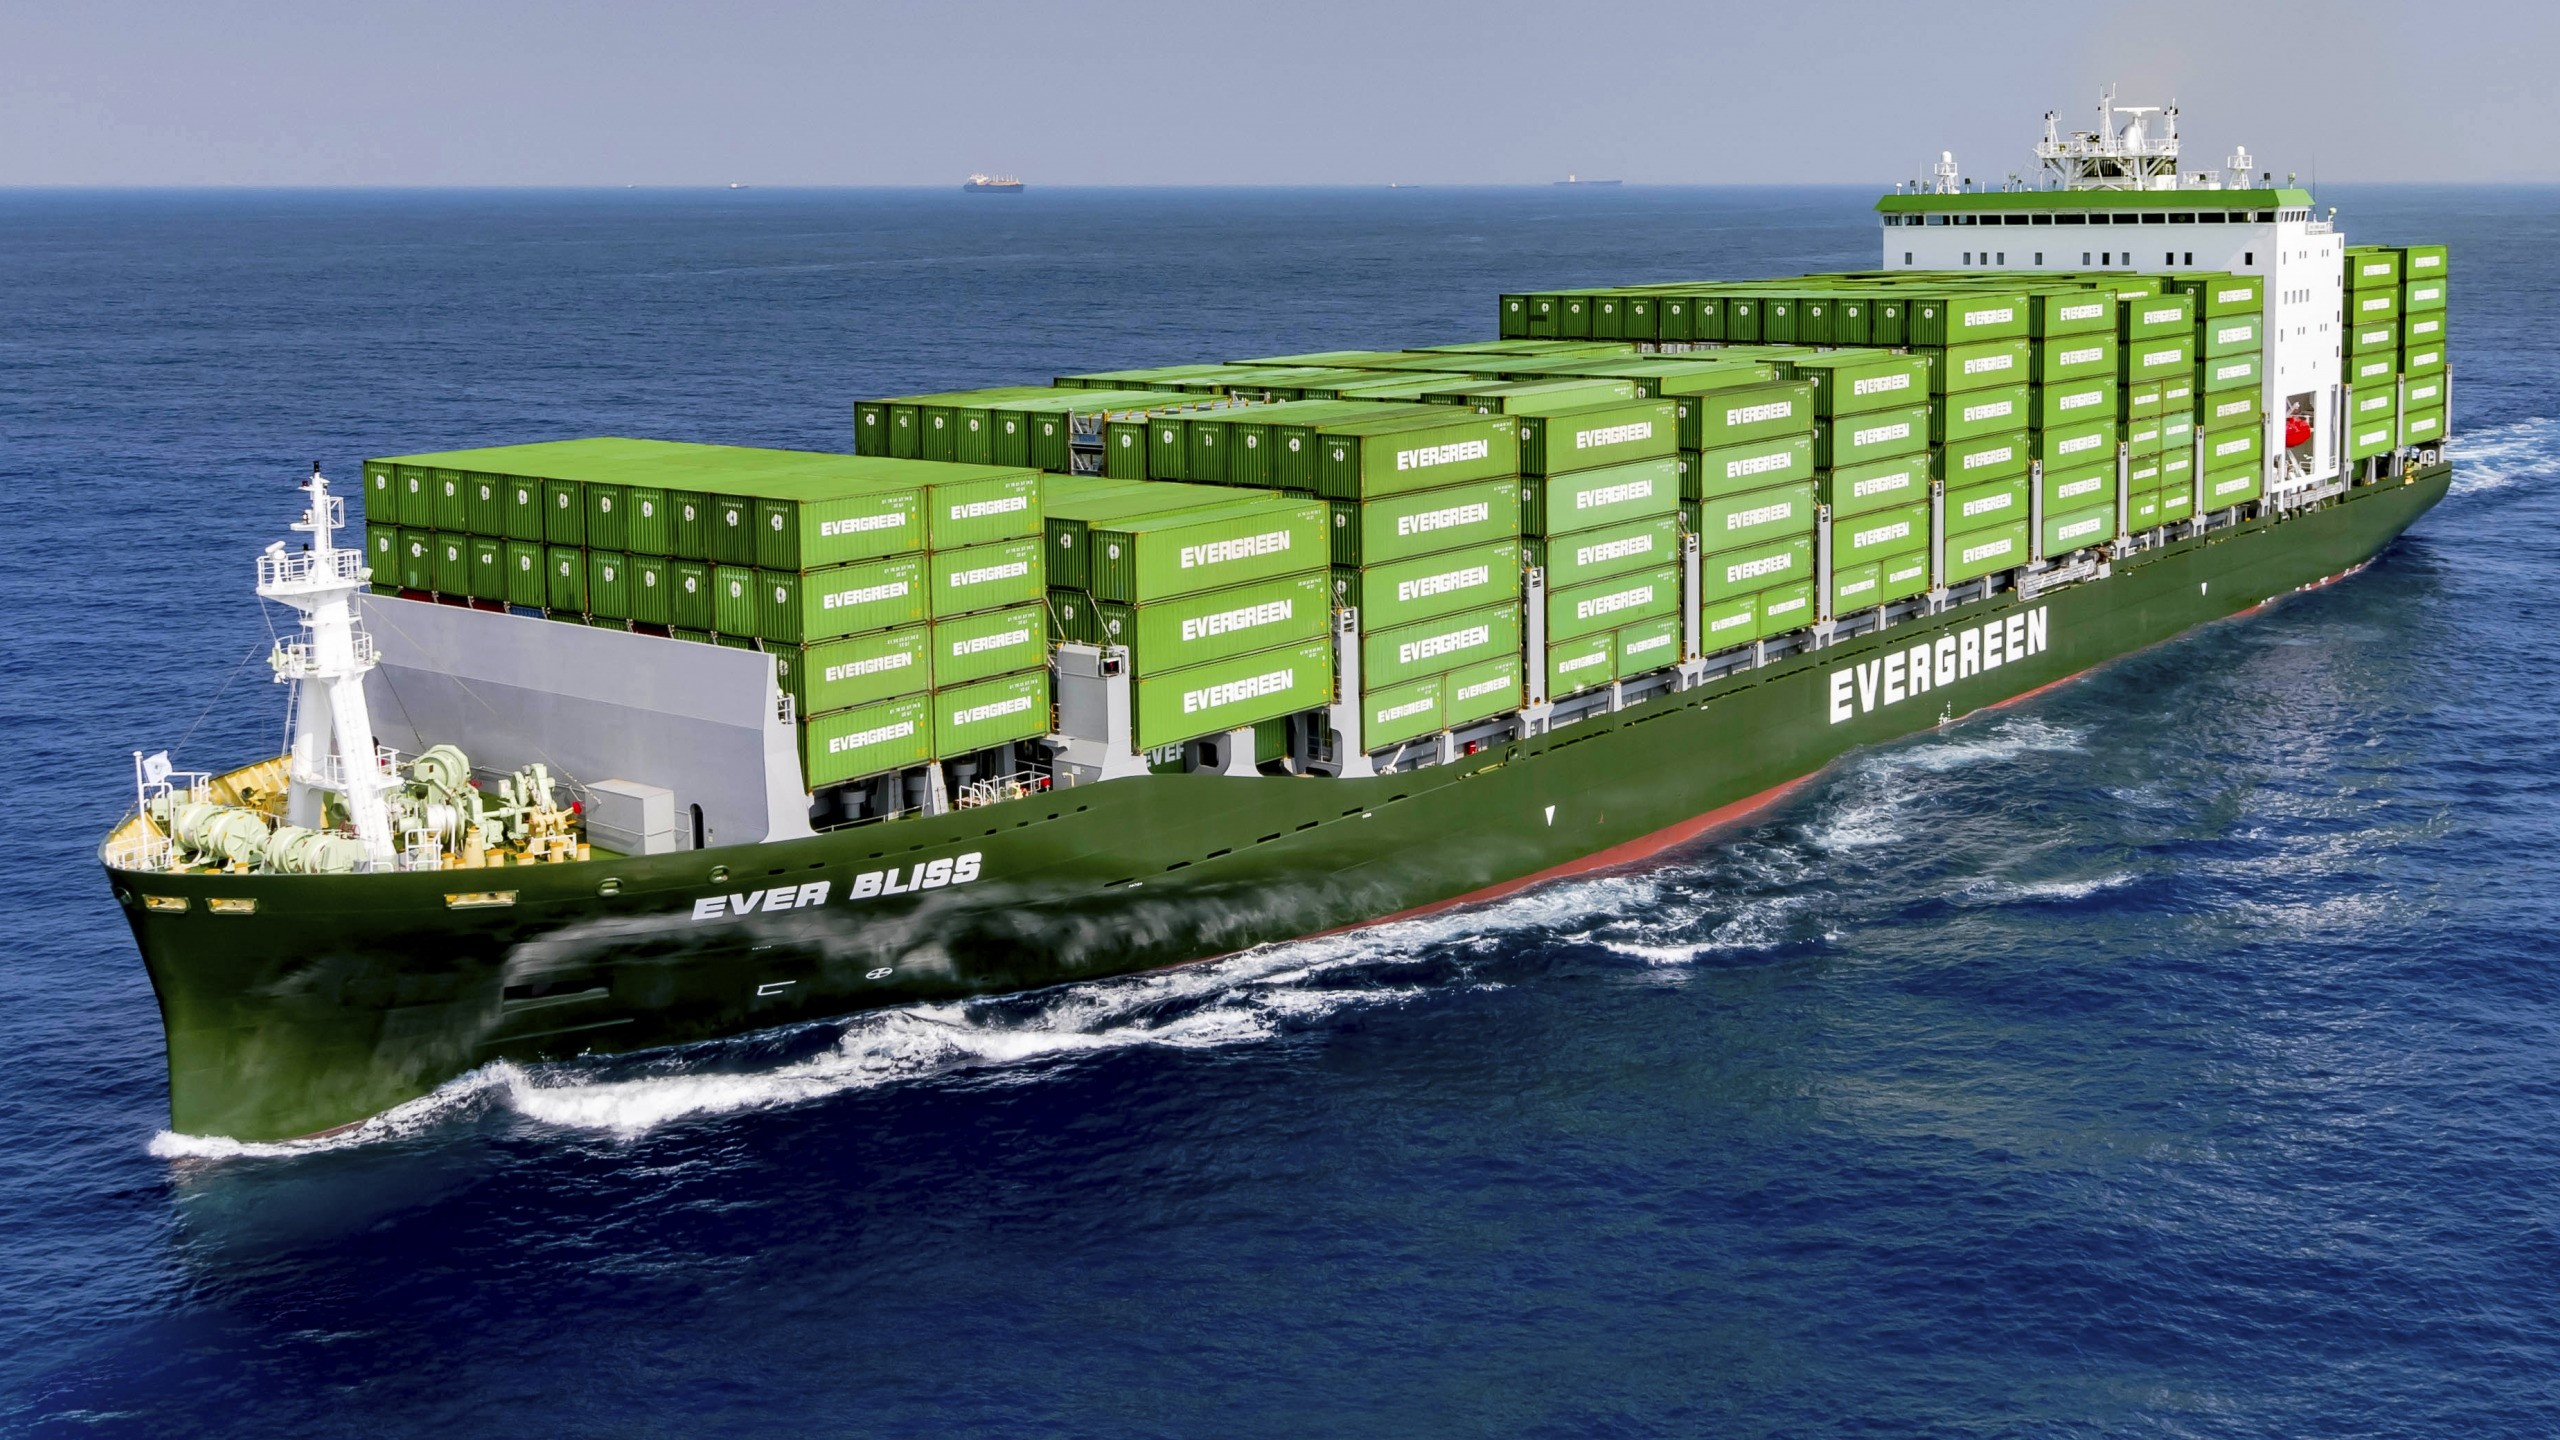 Evergreen is raising $ 300 million investment for future fleet expansion 1